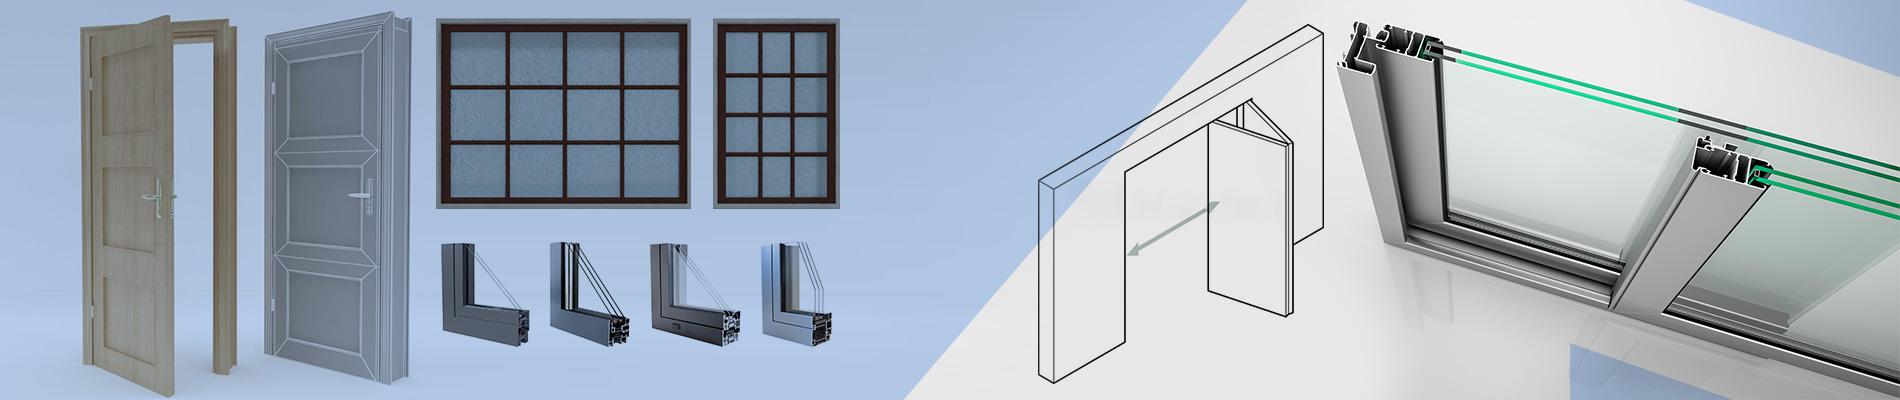 Doors and windows family creation